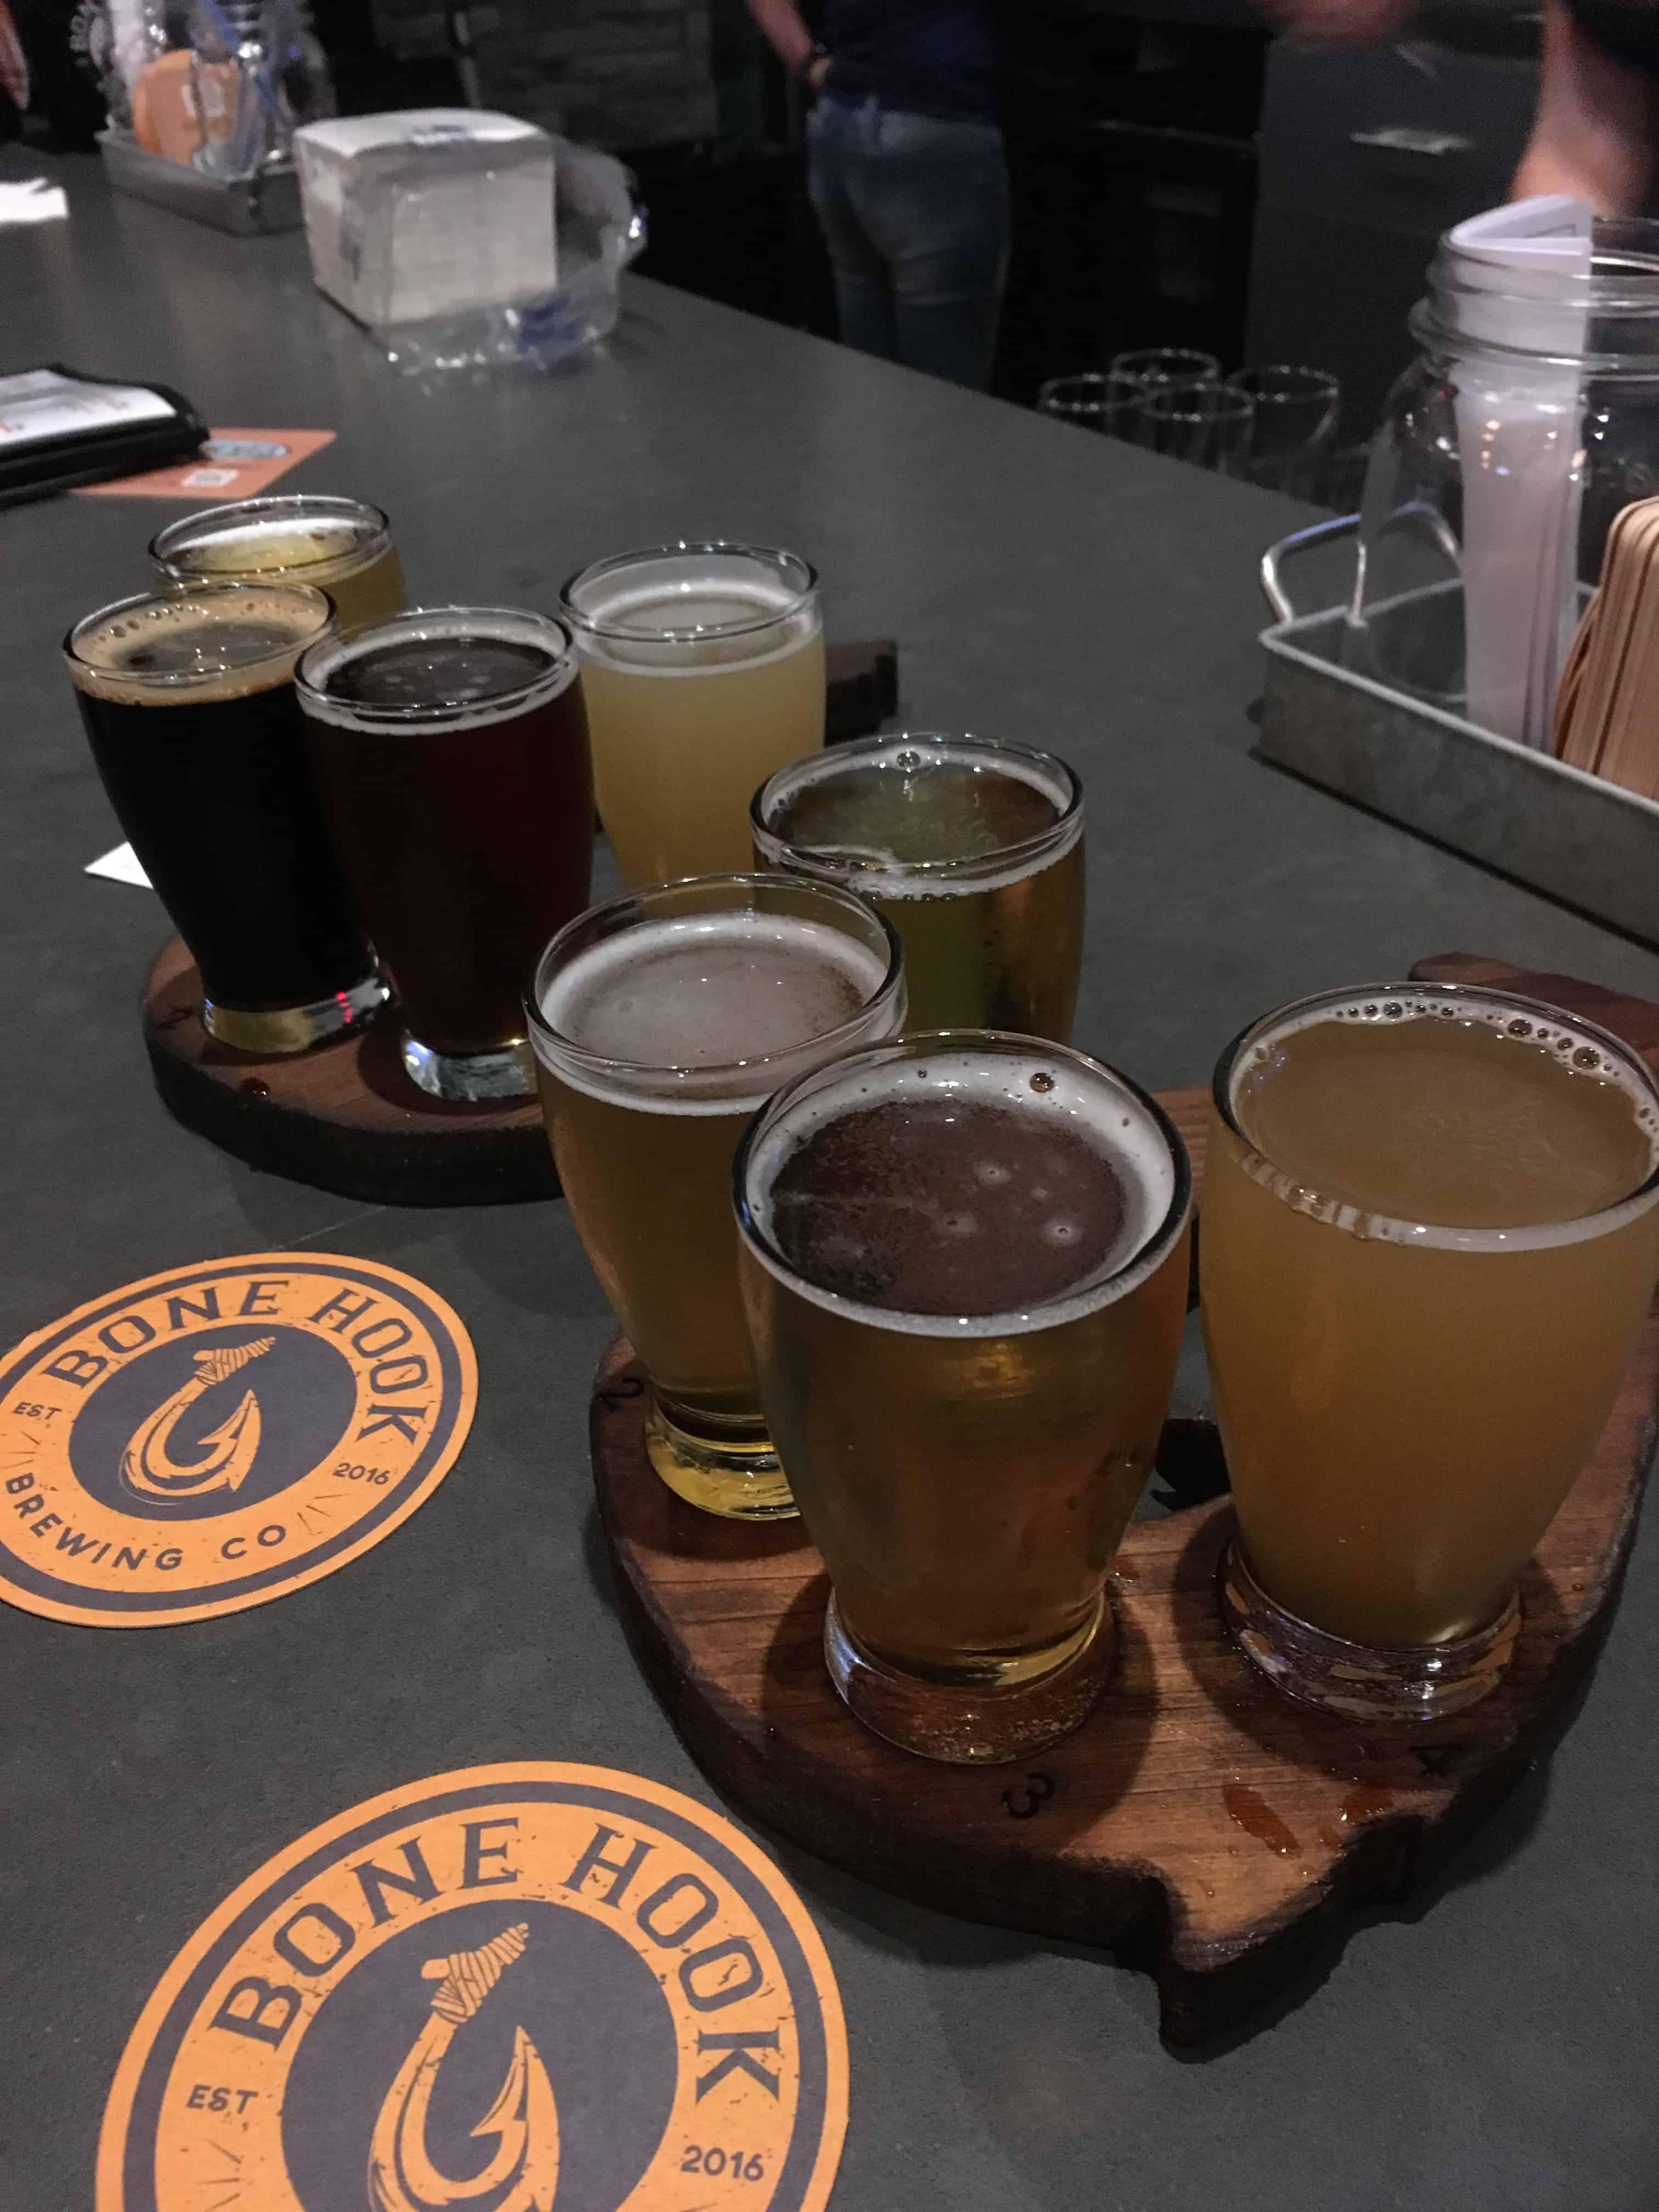 Bone Hook Brewing Co. – Naples' Newest Brewery